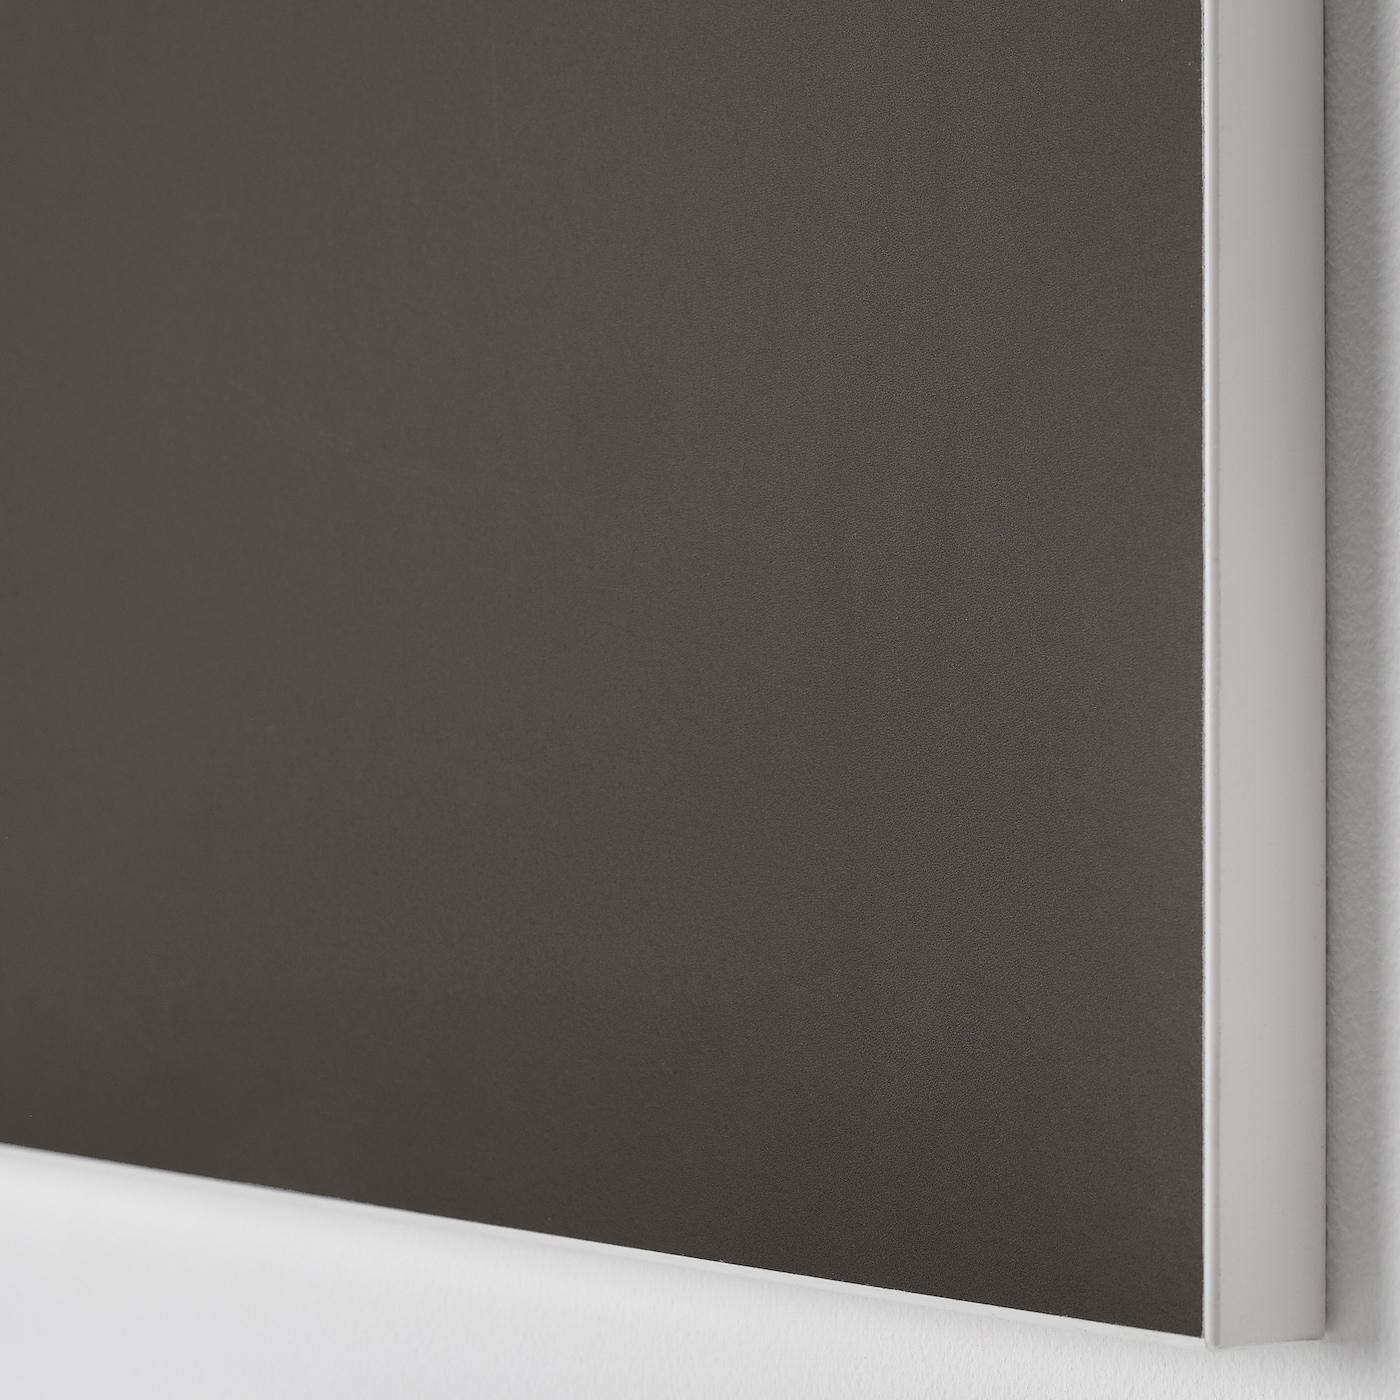 SKATVAL Schublade, weiß/dunkelgrau, 80x57x20 cm